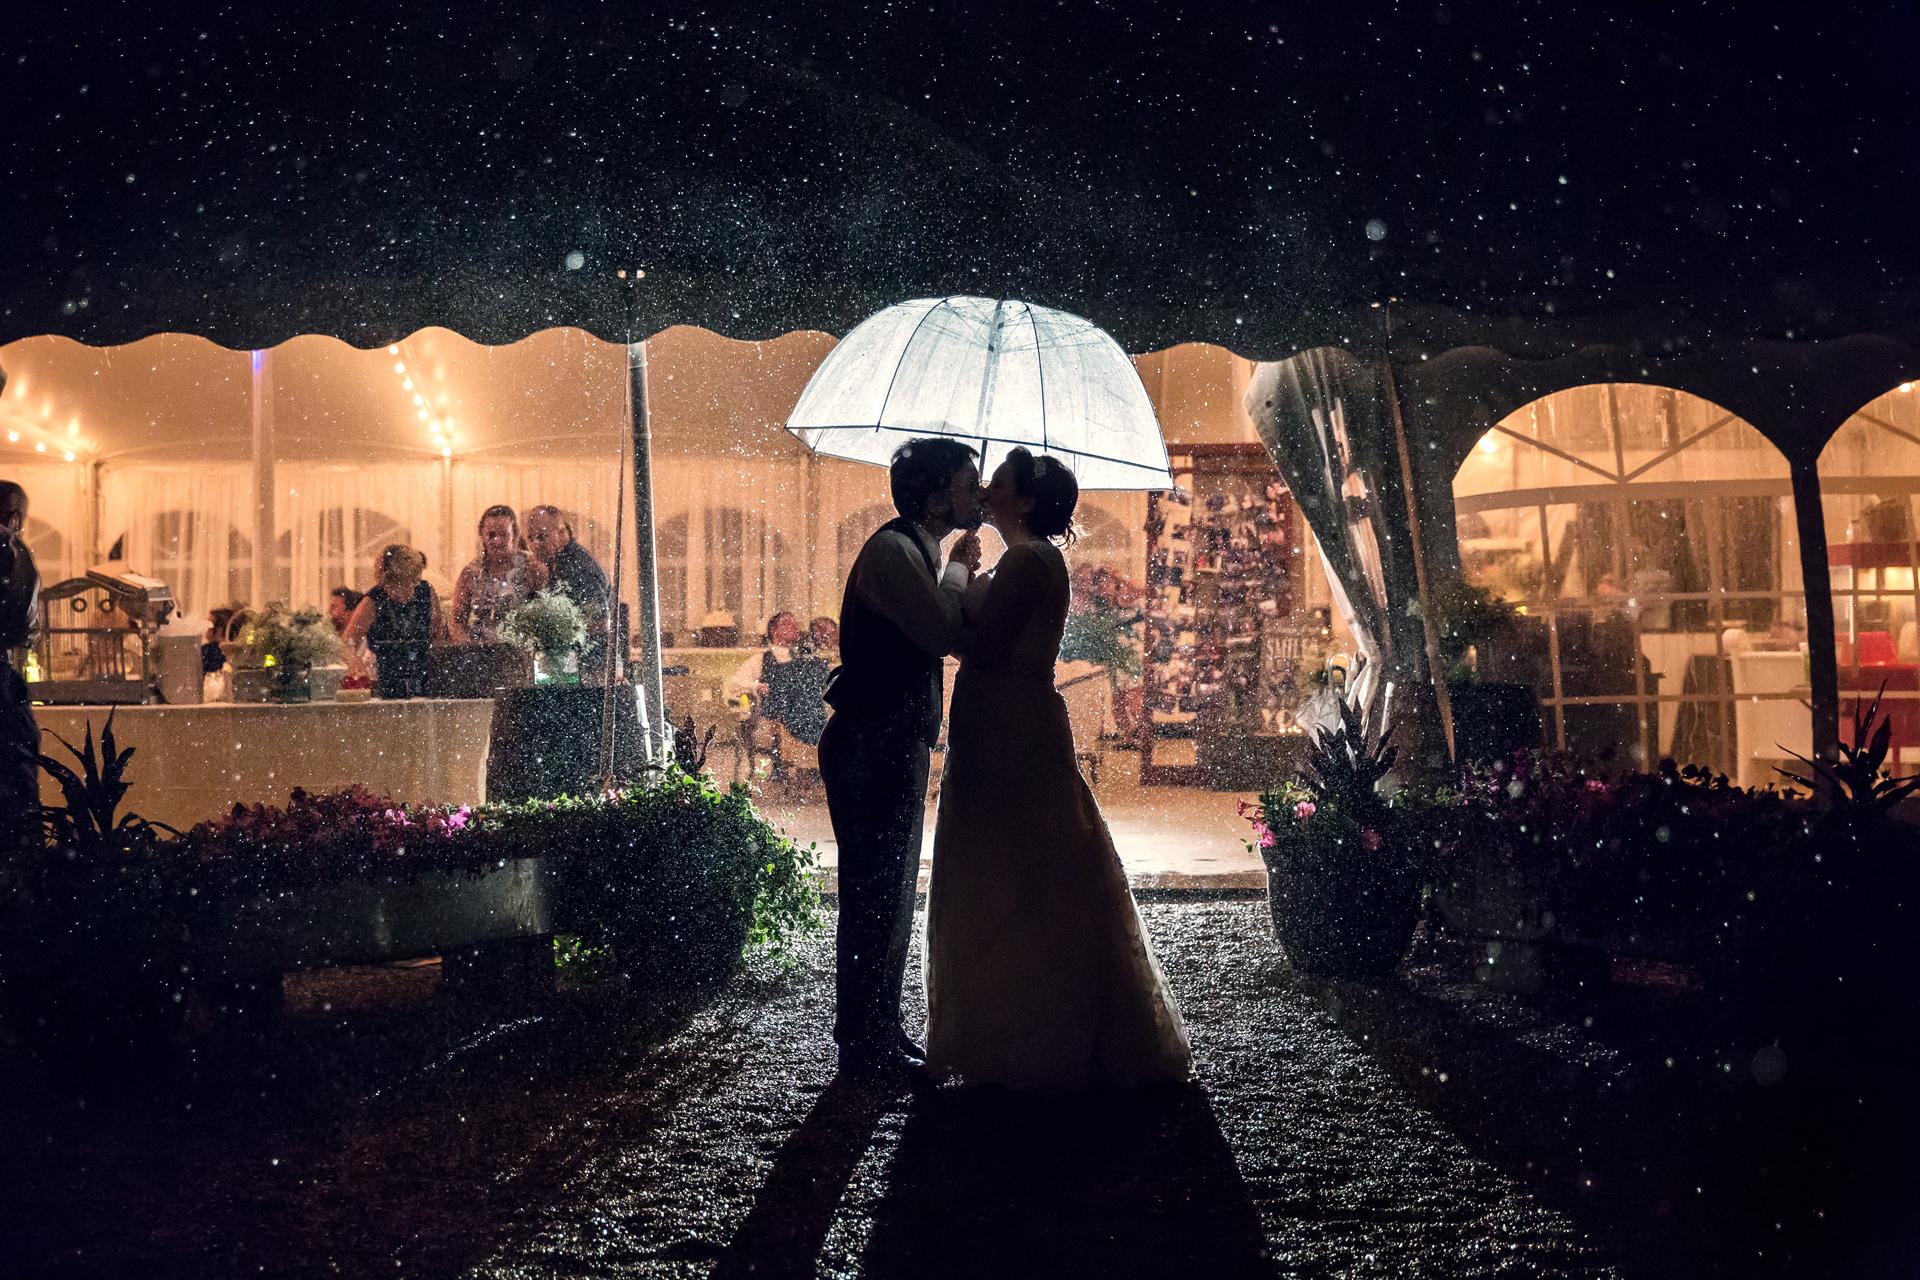 Twinbliss_Photography_Chicago_Weddings_Engagements_Heritage_Prairie_Farm_Illinois